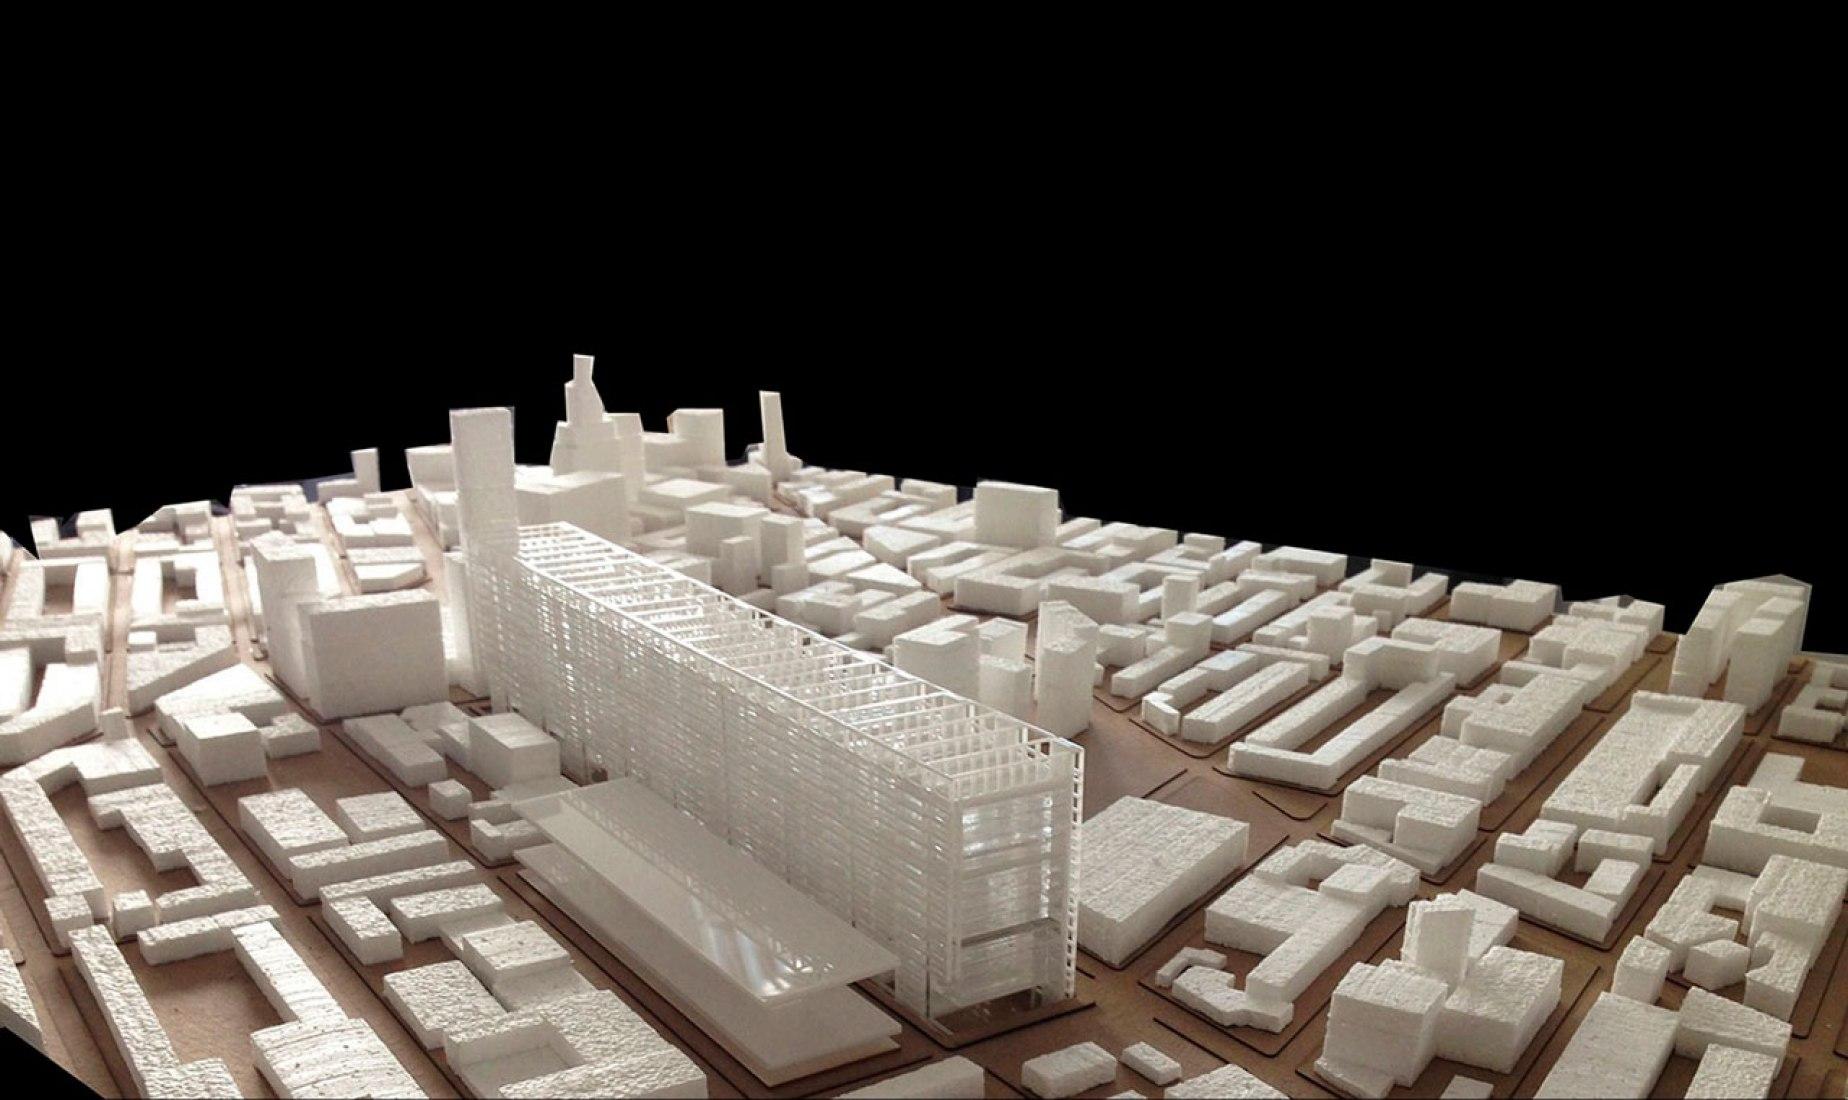 Matthias Altwicker's and Farzana Gandhi's Flexible City.